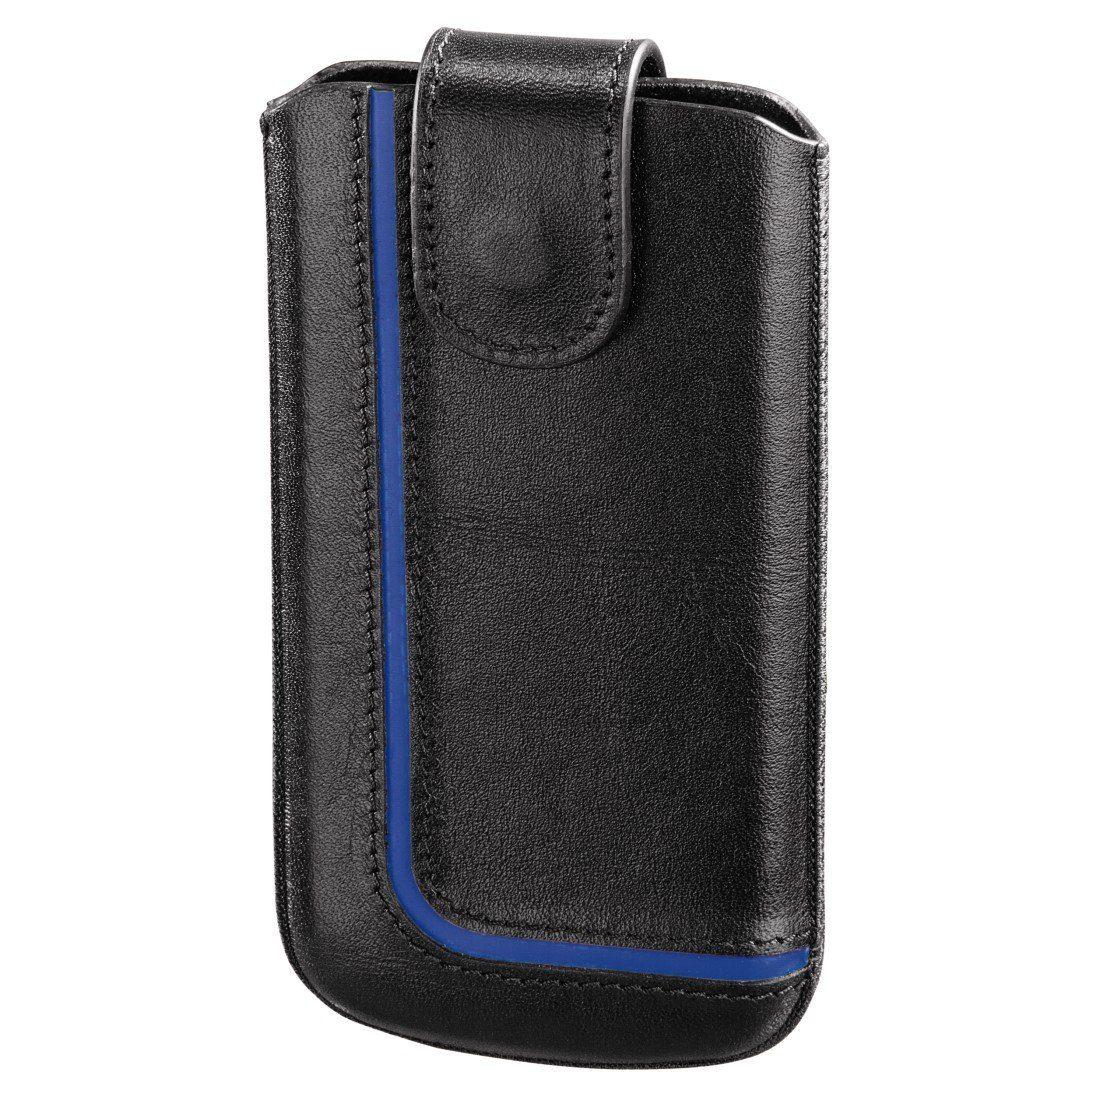 Hama Handy-Sleeve Neon Black, Gr. XL, Schwarz/Blau